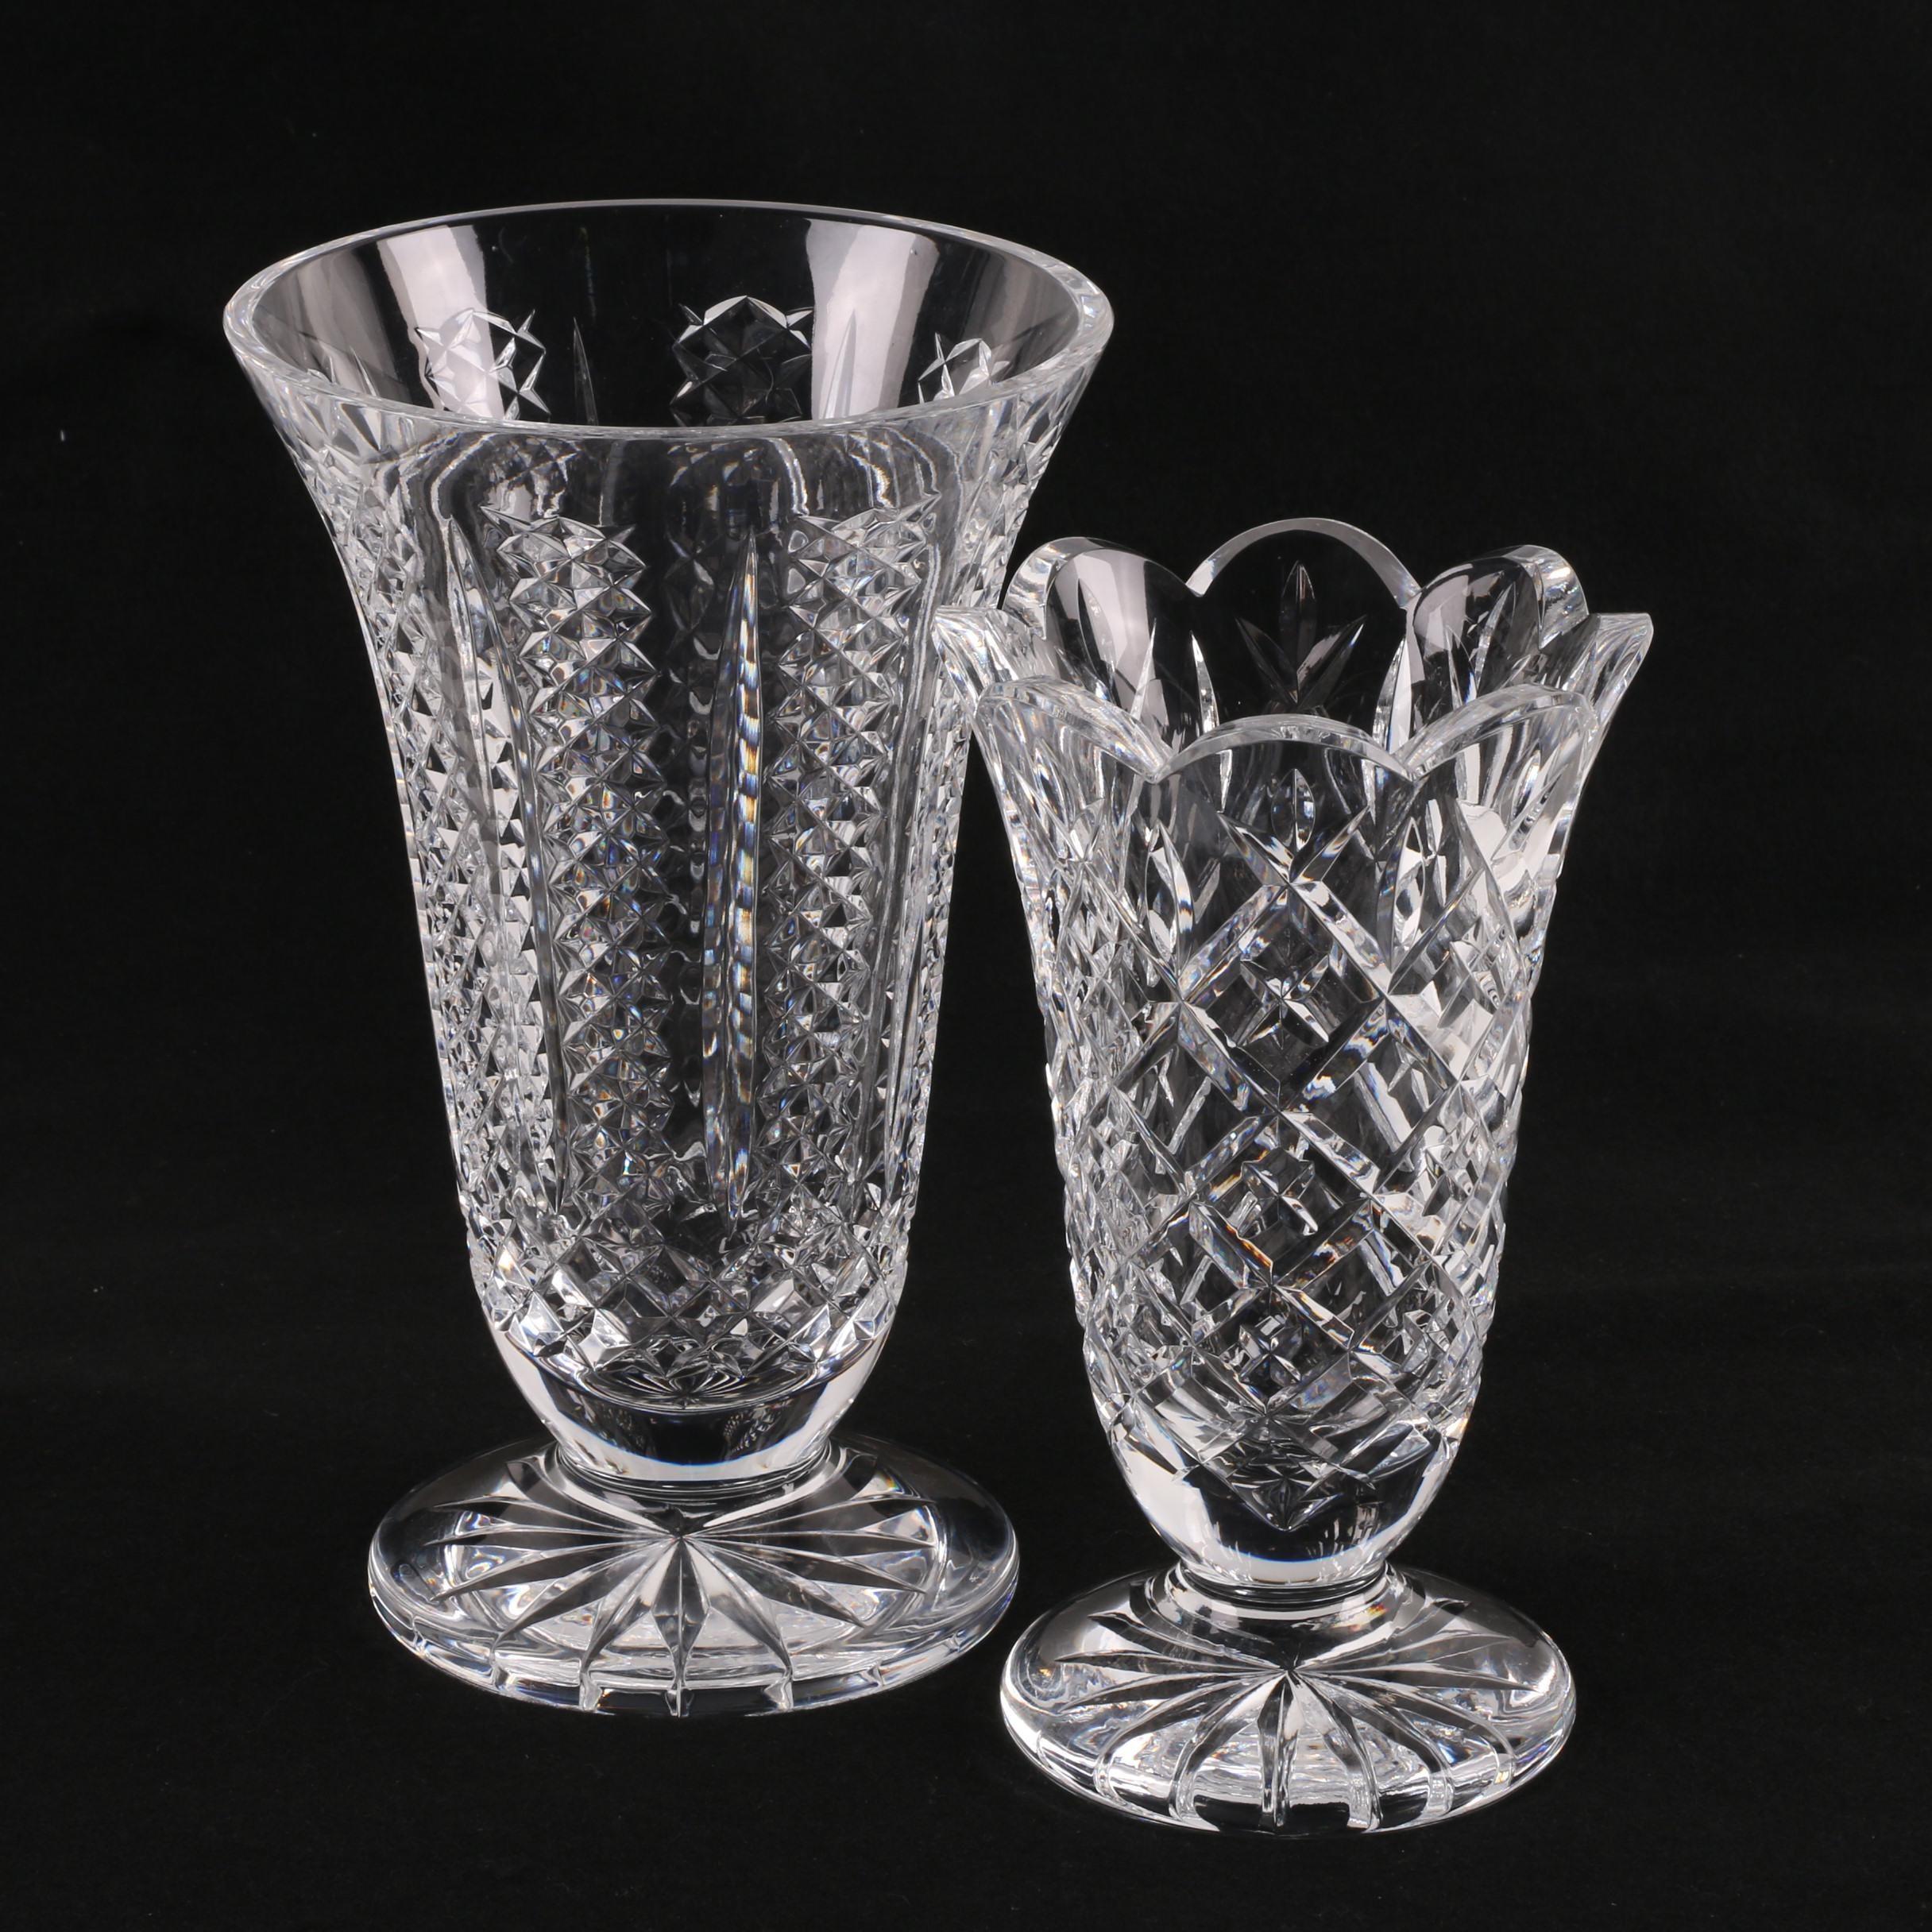 Waterford Crystal Footed Flower Vases